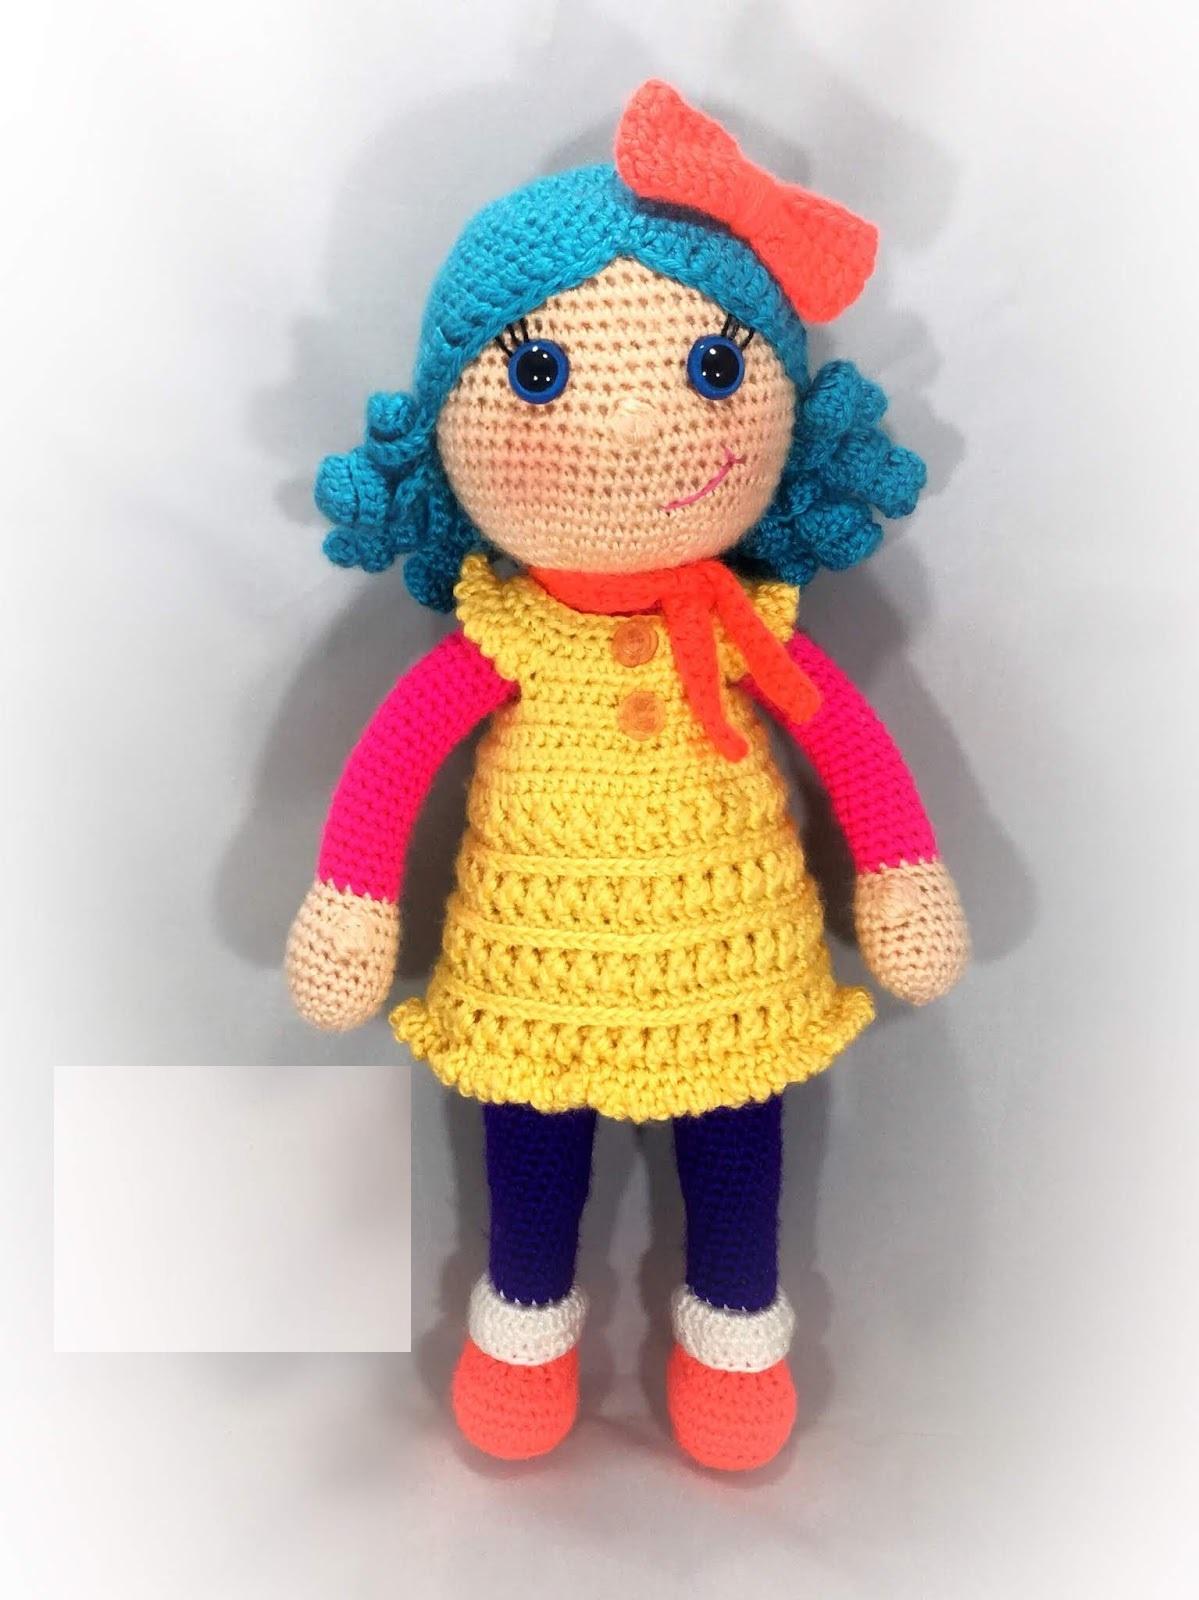 cute-amigurumi-amigurumi-chloe-doll-cal-free-pattern-4 Amigurumi Chloe Doll Cal Ücretsiz Desen